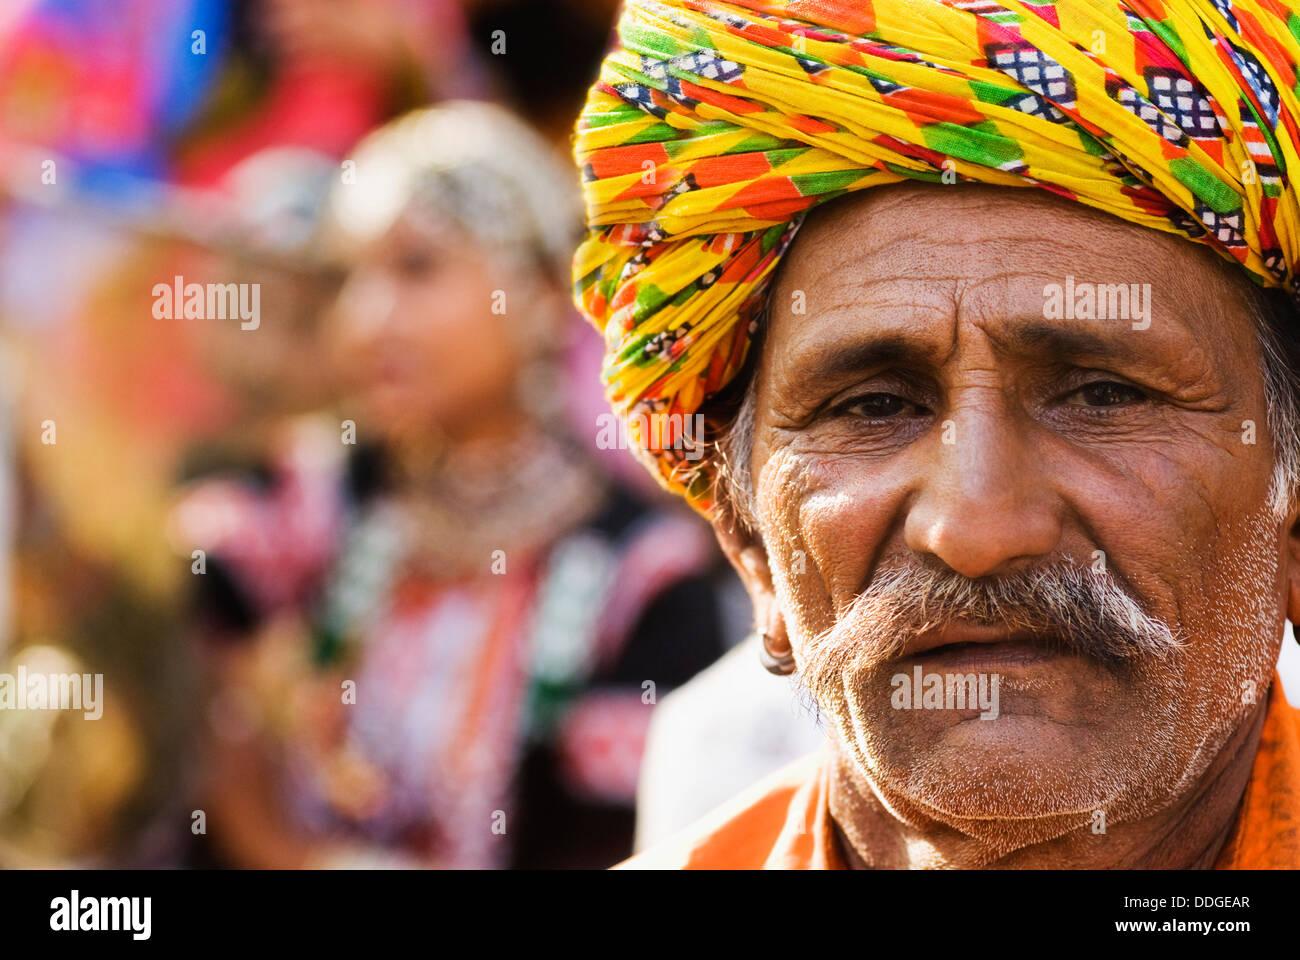 Portrait d'un homme en robe traditionnelle du Rajasthan à Surajkund Mela, Faridabad, Haryana, Inde Banque D'Images